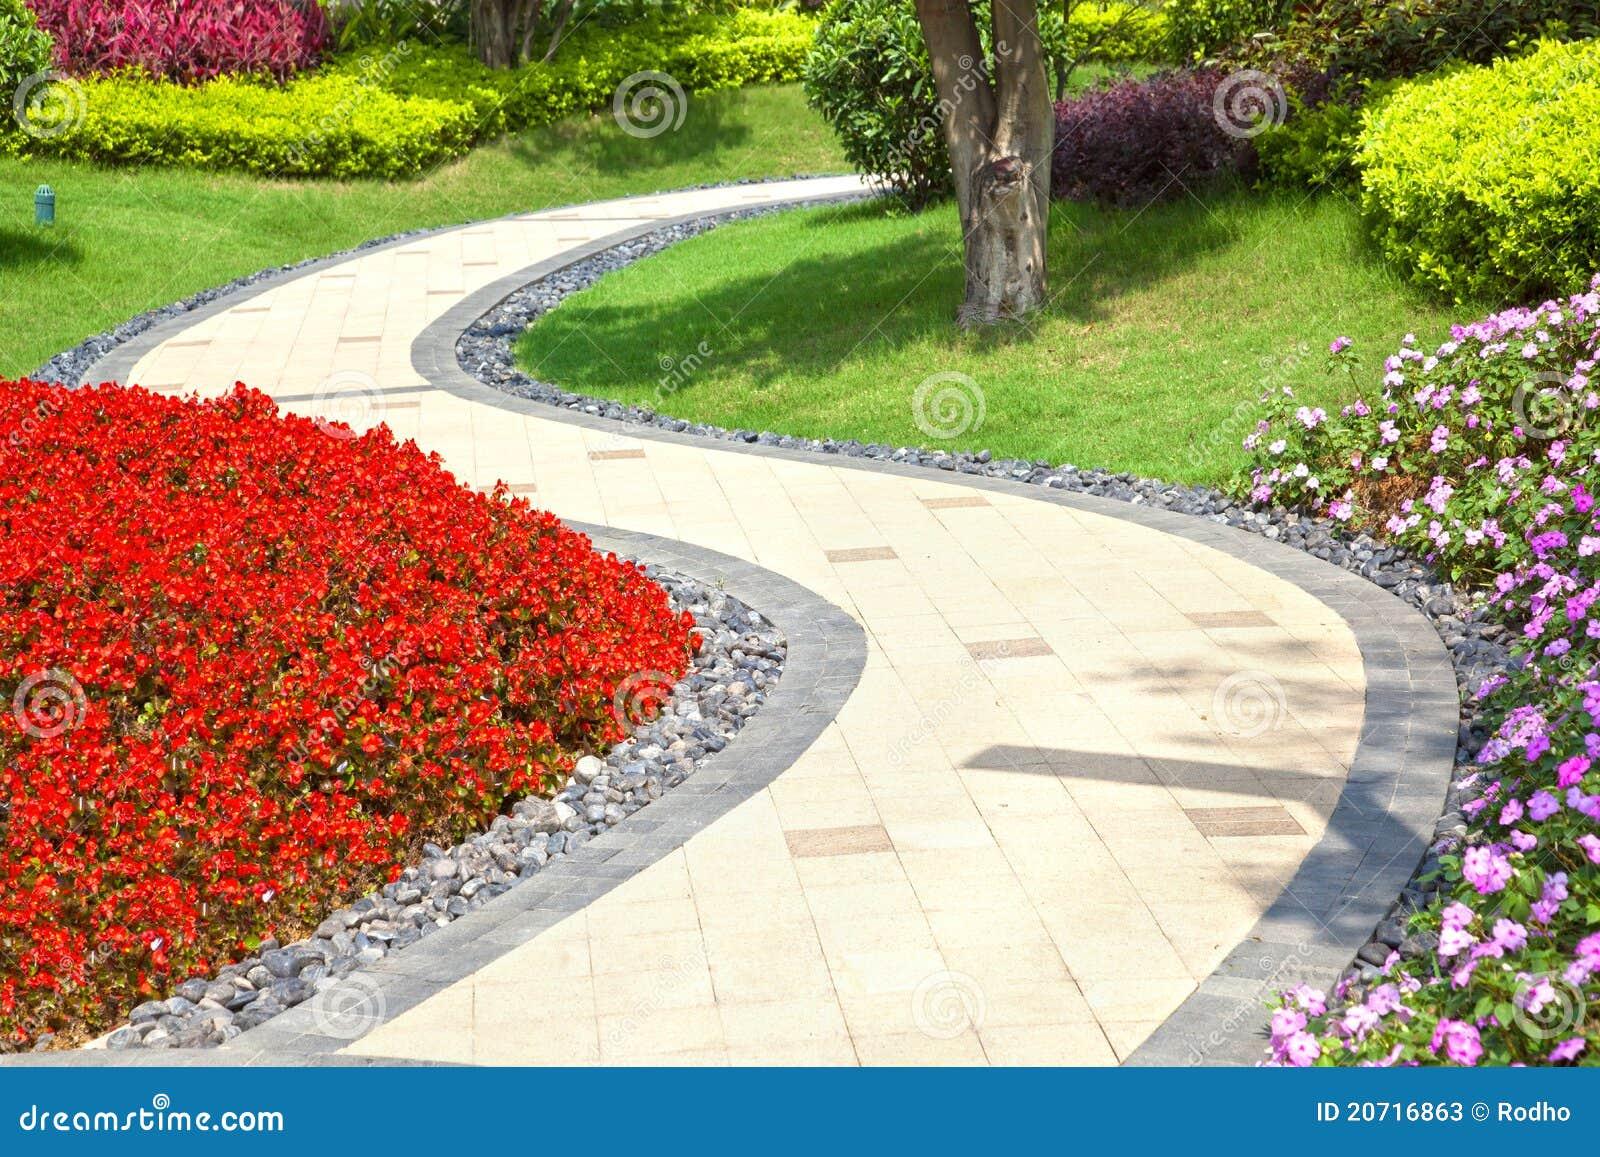 Garden Walkway Royalty Free Stock Photography - Image: 19304467